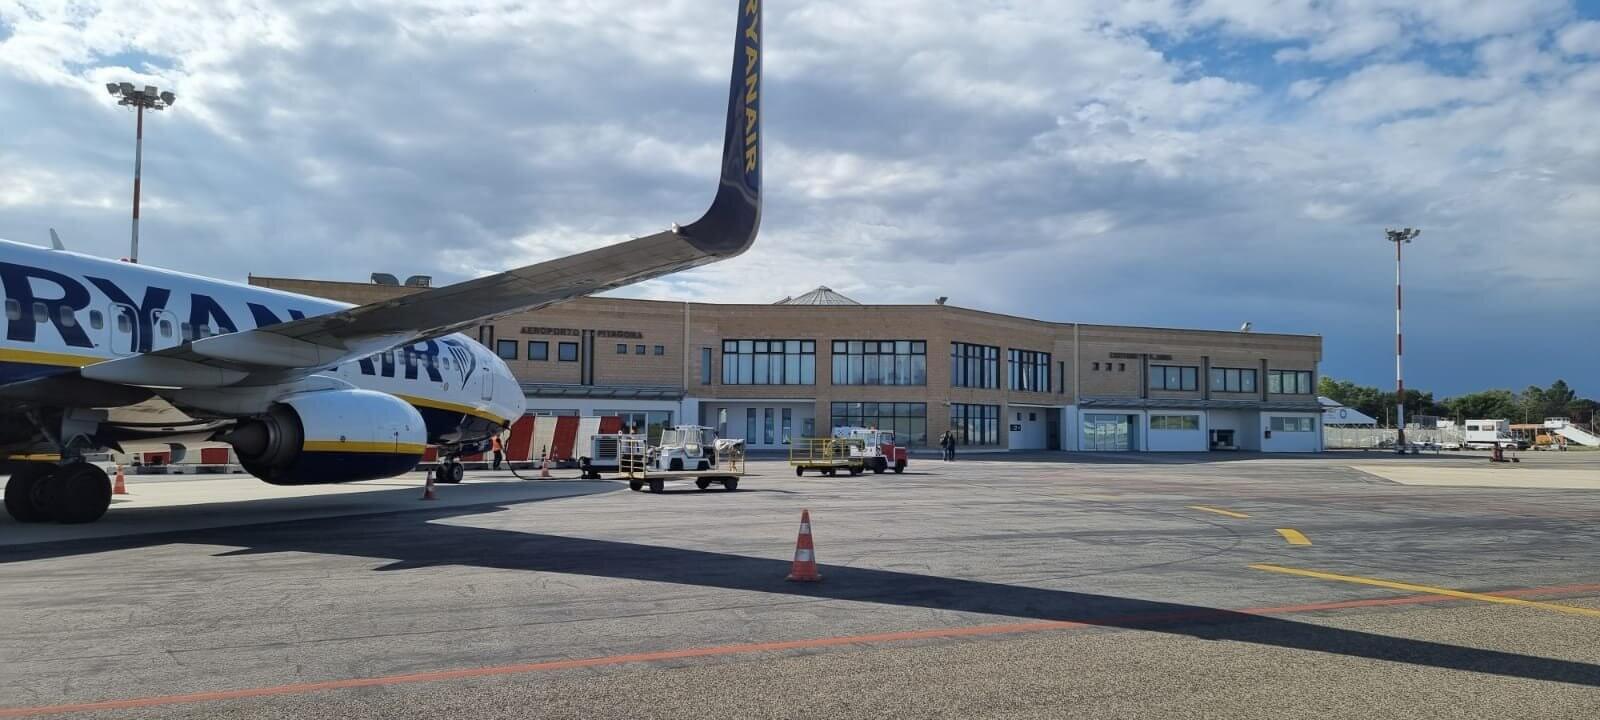 Aeroporto Crotone Ryanair